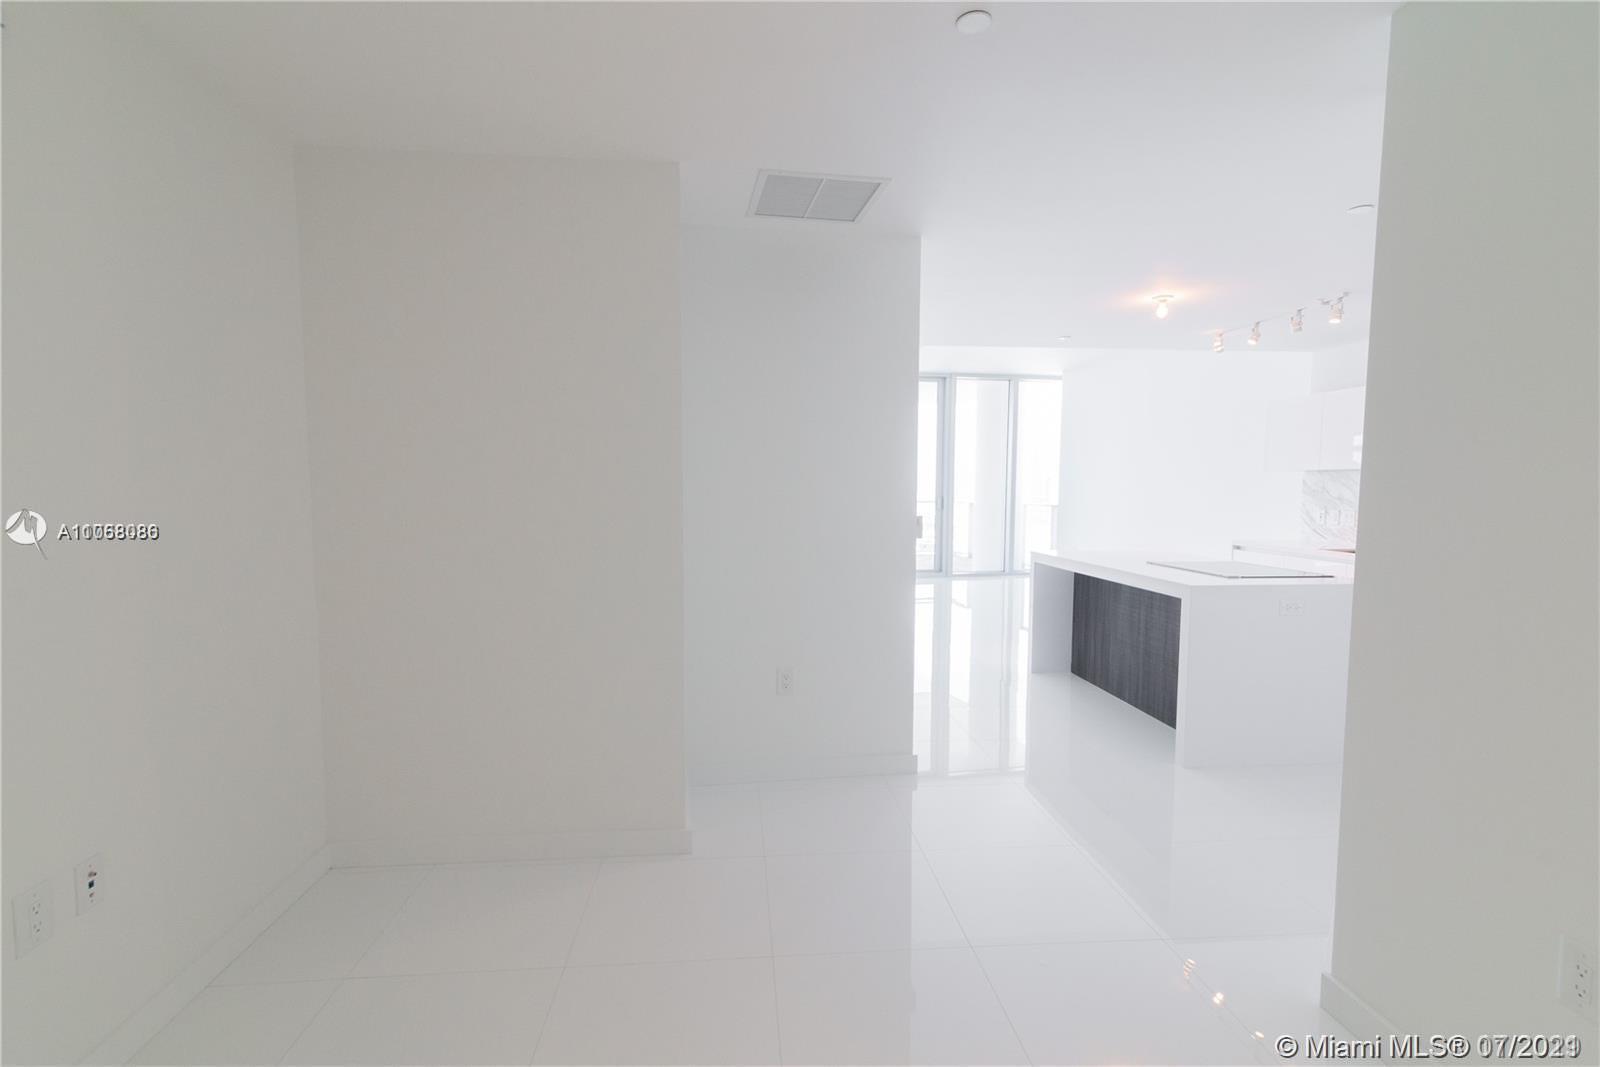 Paramount Miami Worldcenter #4200 - 20 - photo